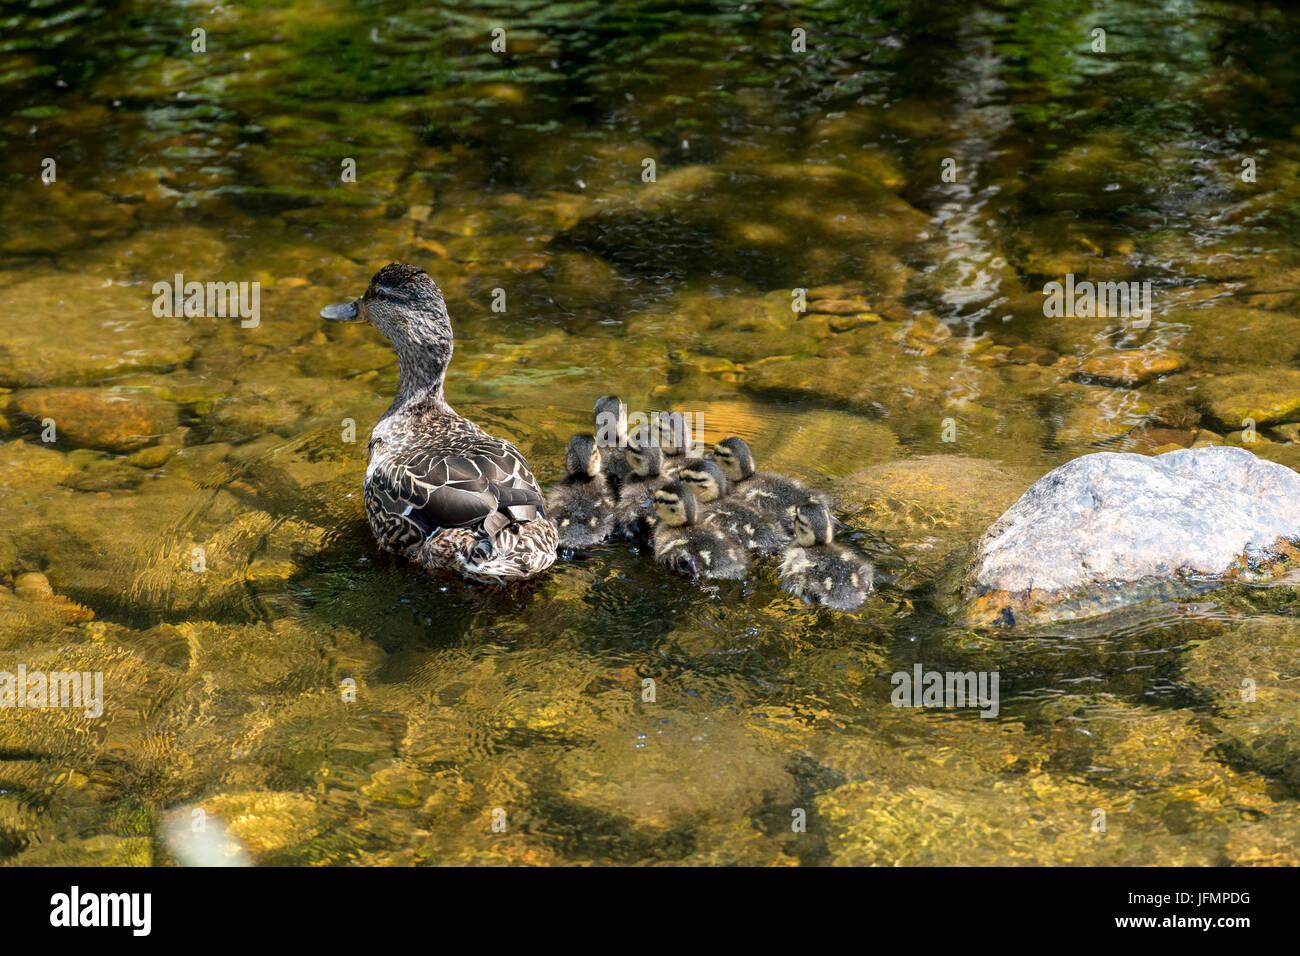 Female Mallard duck, Anas platyrhynchos, with brood of 8 ducklings swimming on upland stream, North Yorkshire, UK. - Stock Image